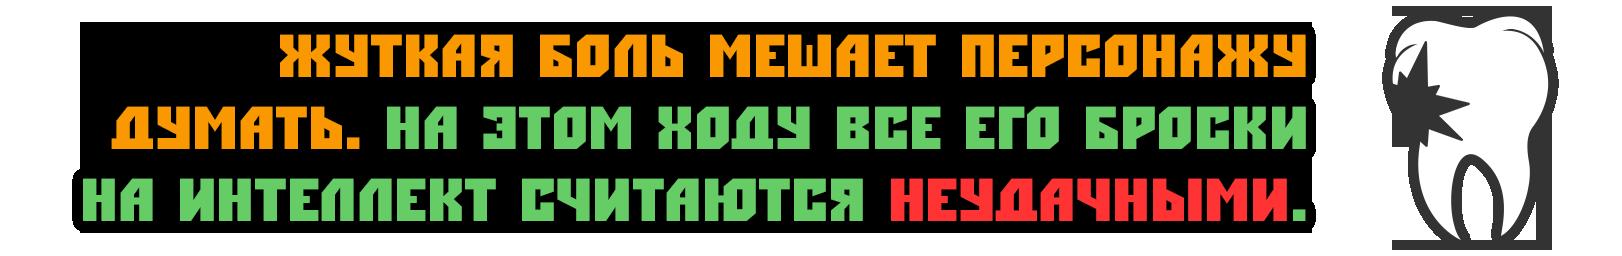 Тест боевой системы - Страница 8 O4ki_Urona_Zhutkaja_bol_Forum_Vova_2